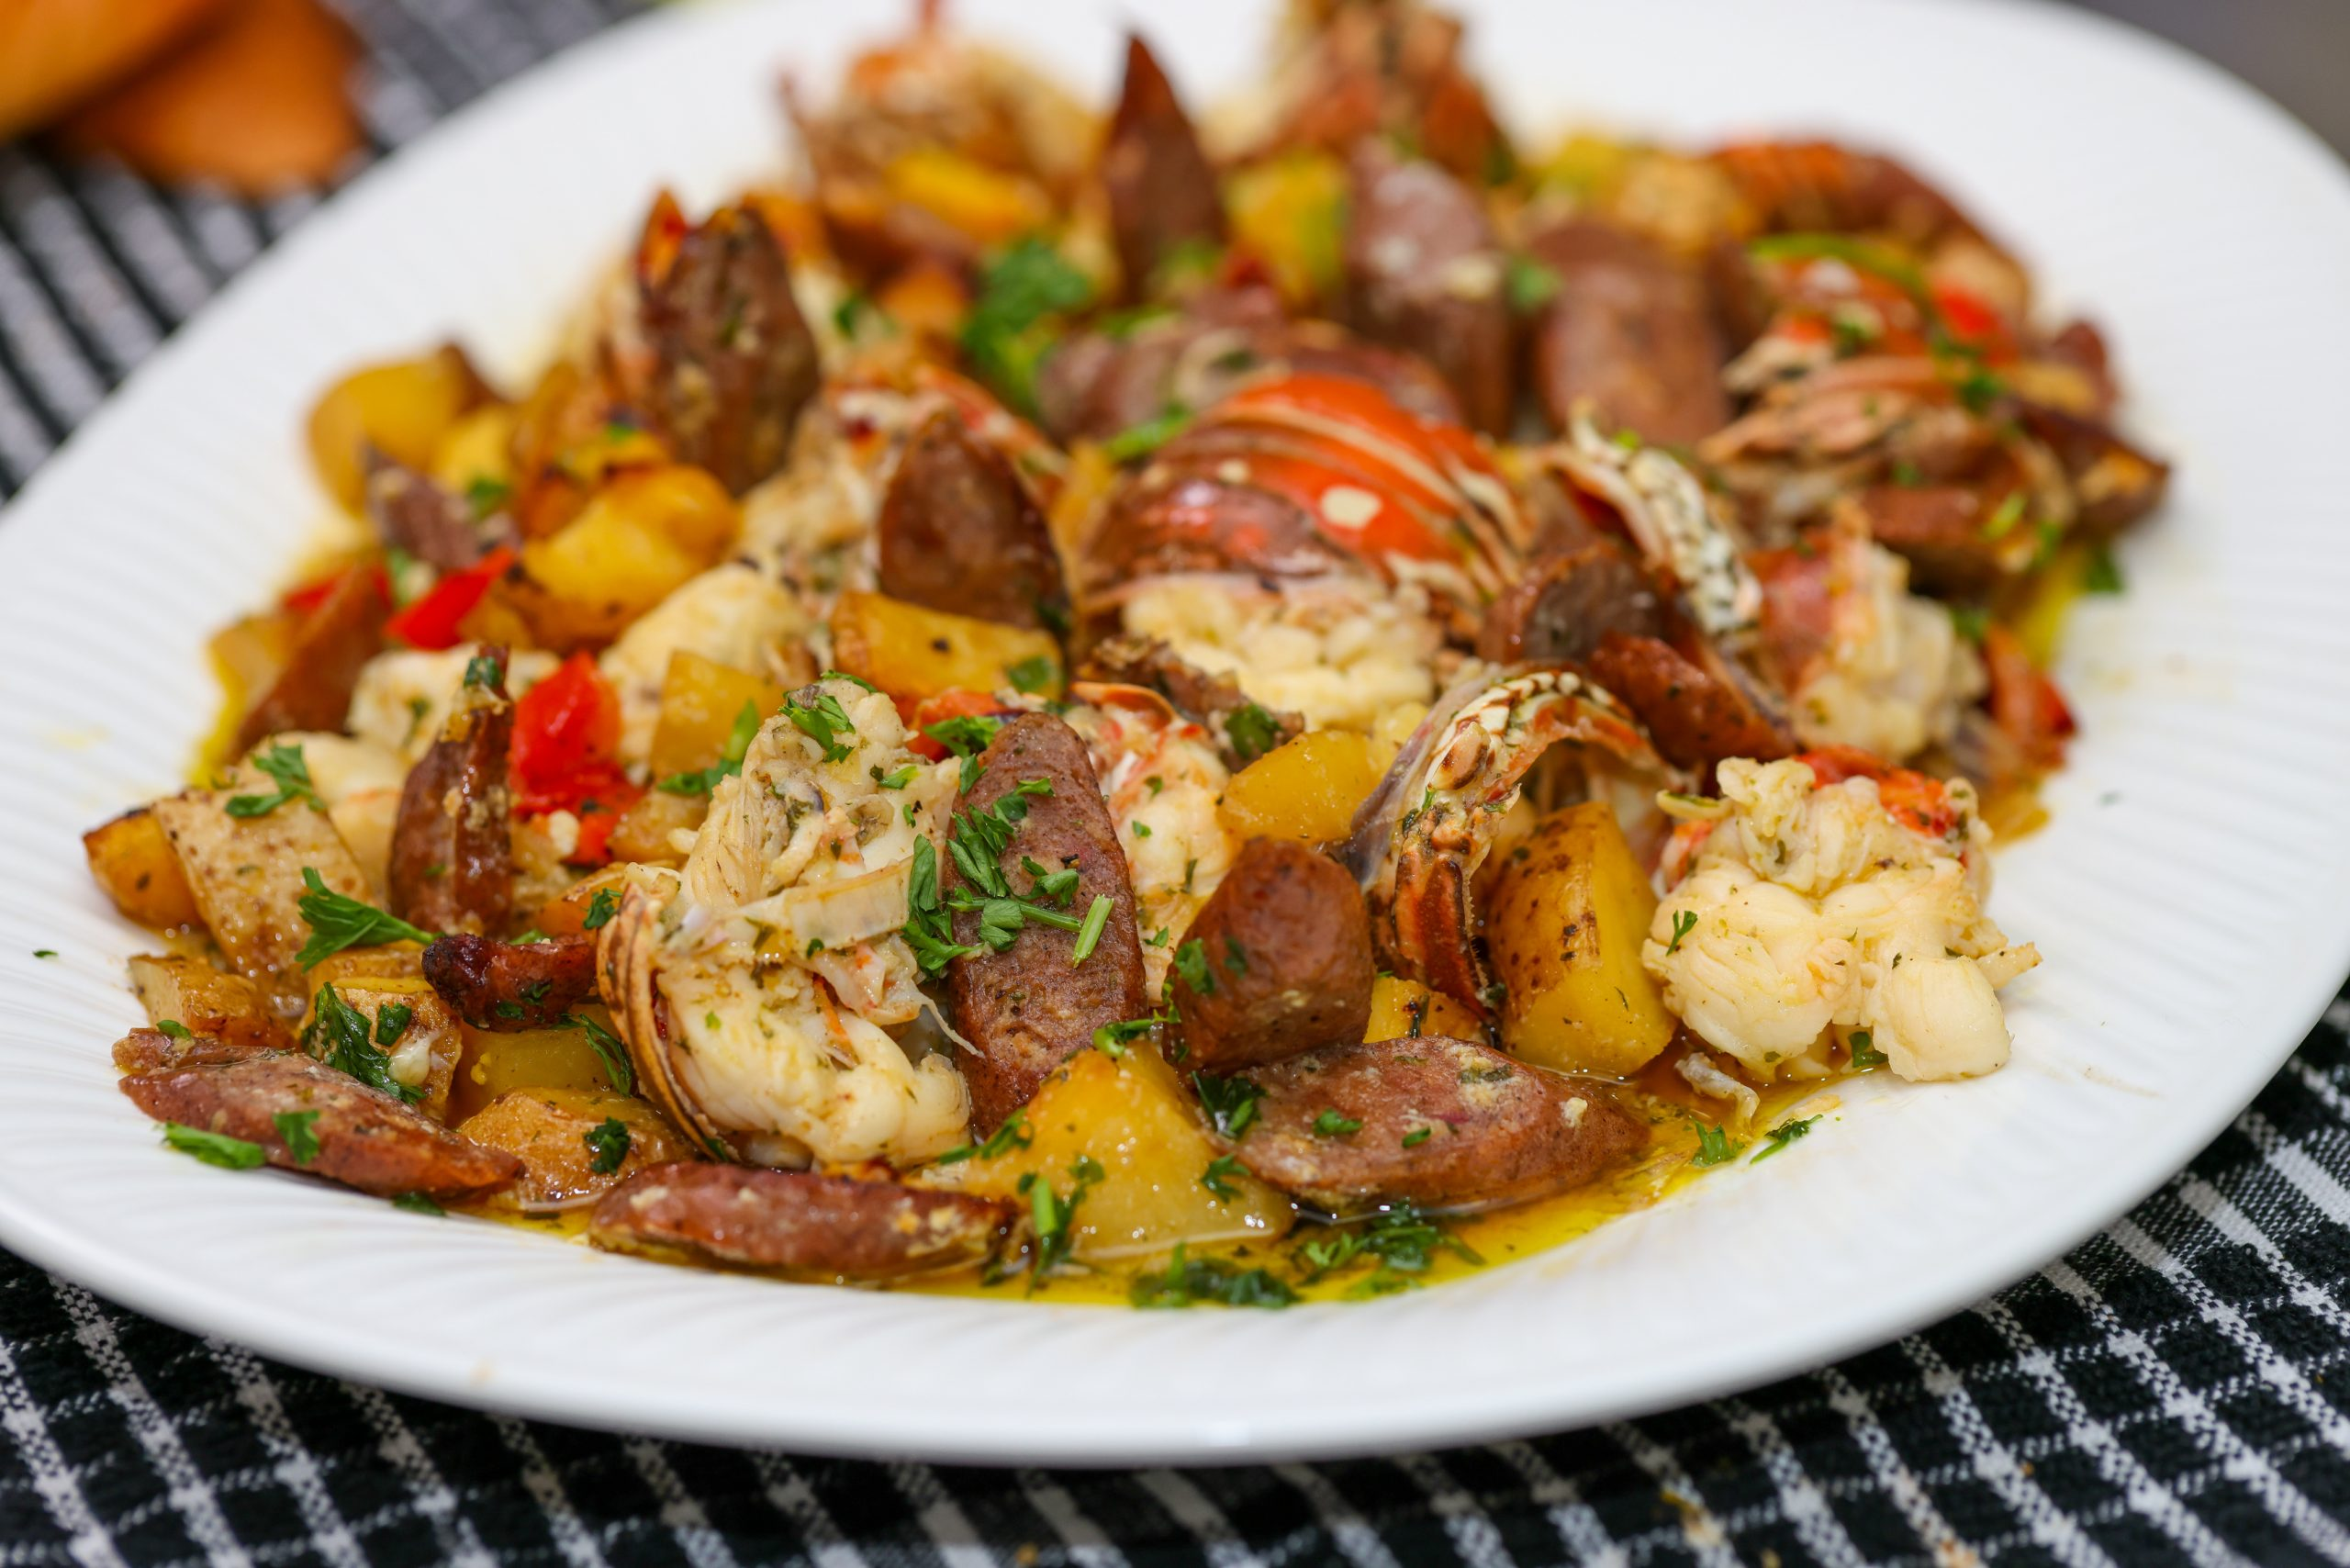 Lobster Boil with Jerk Chicken Sausage